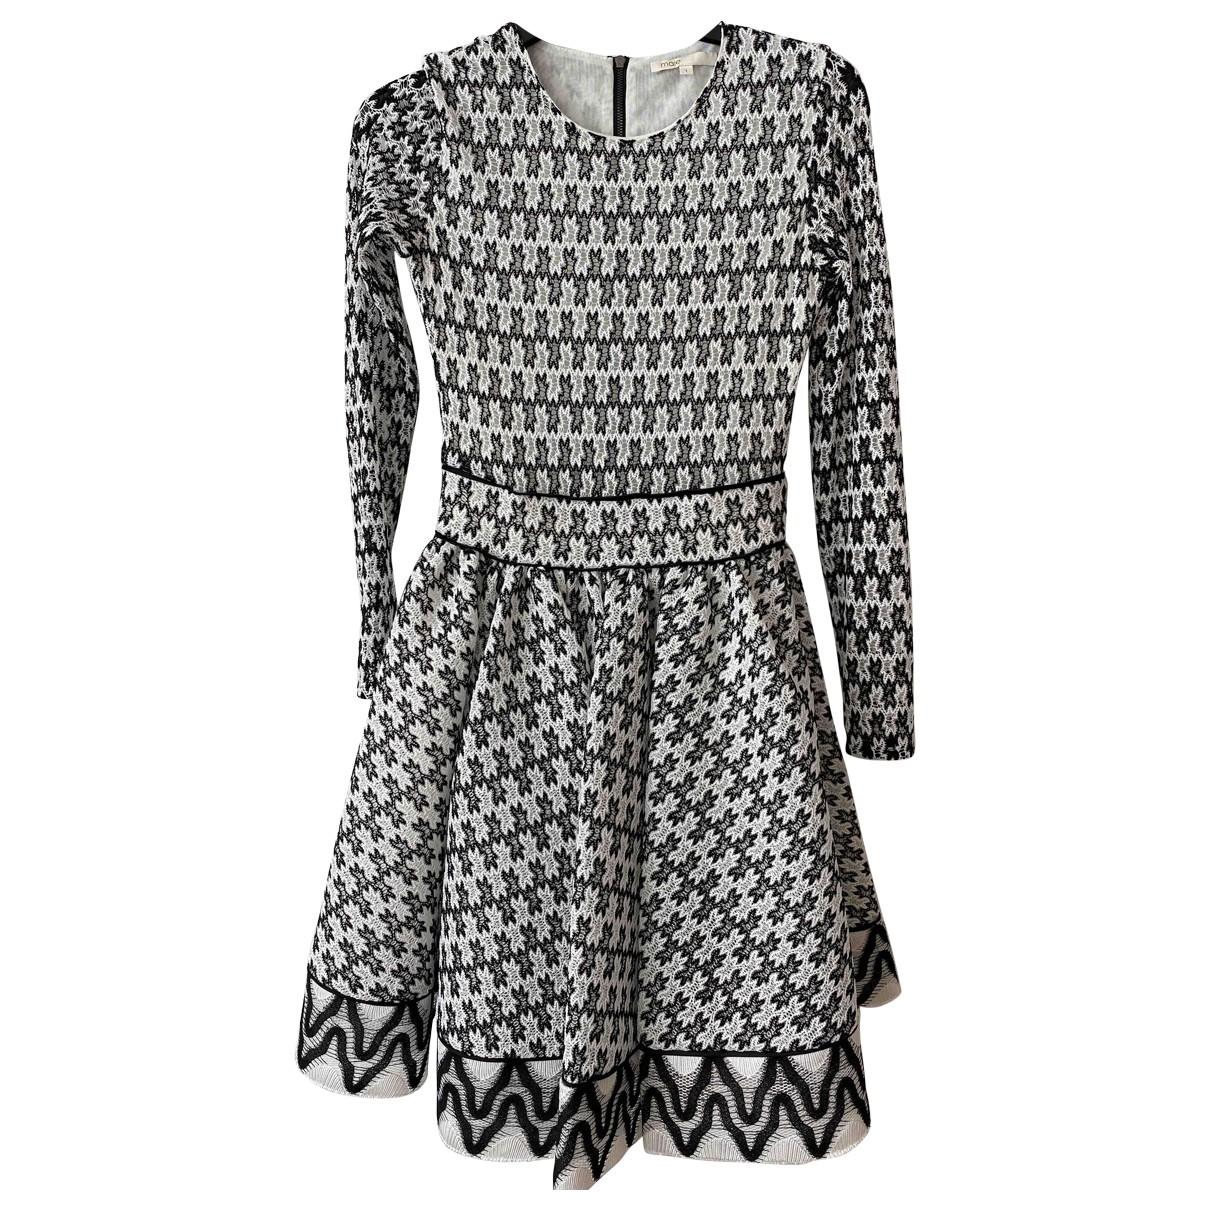 Maje \N Grey dress for Women 1 0-5